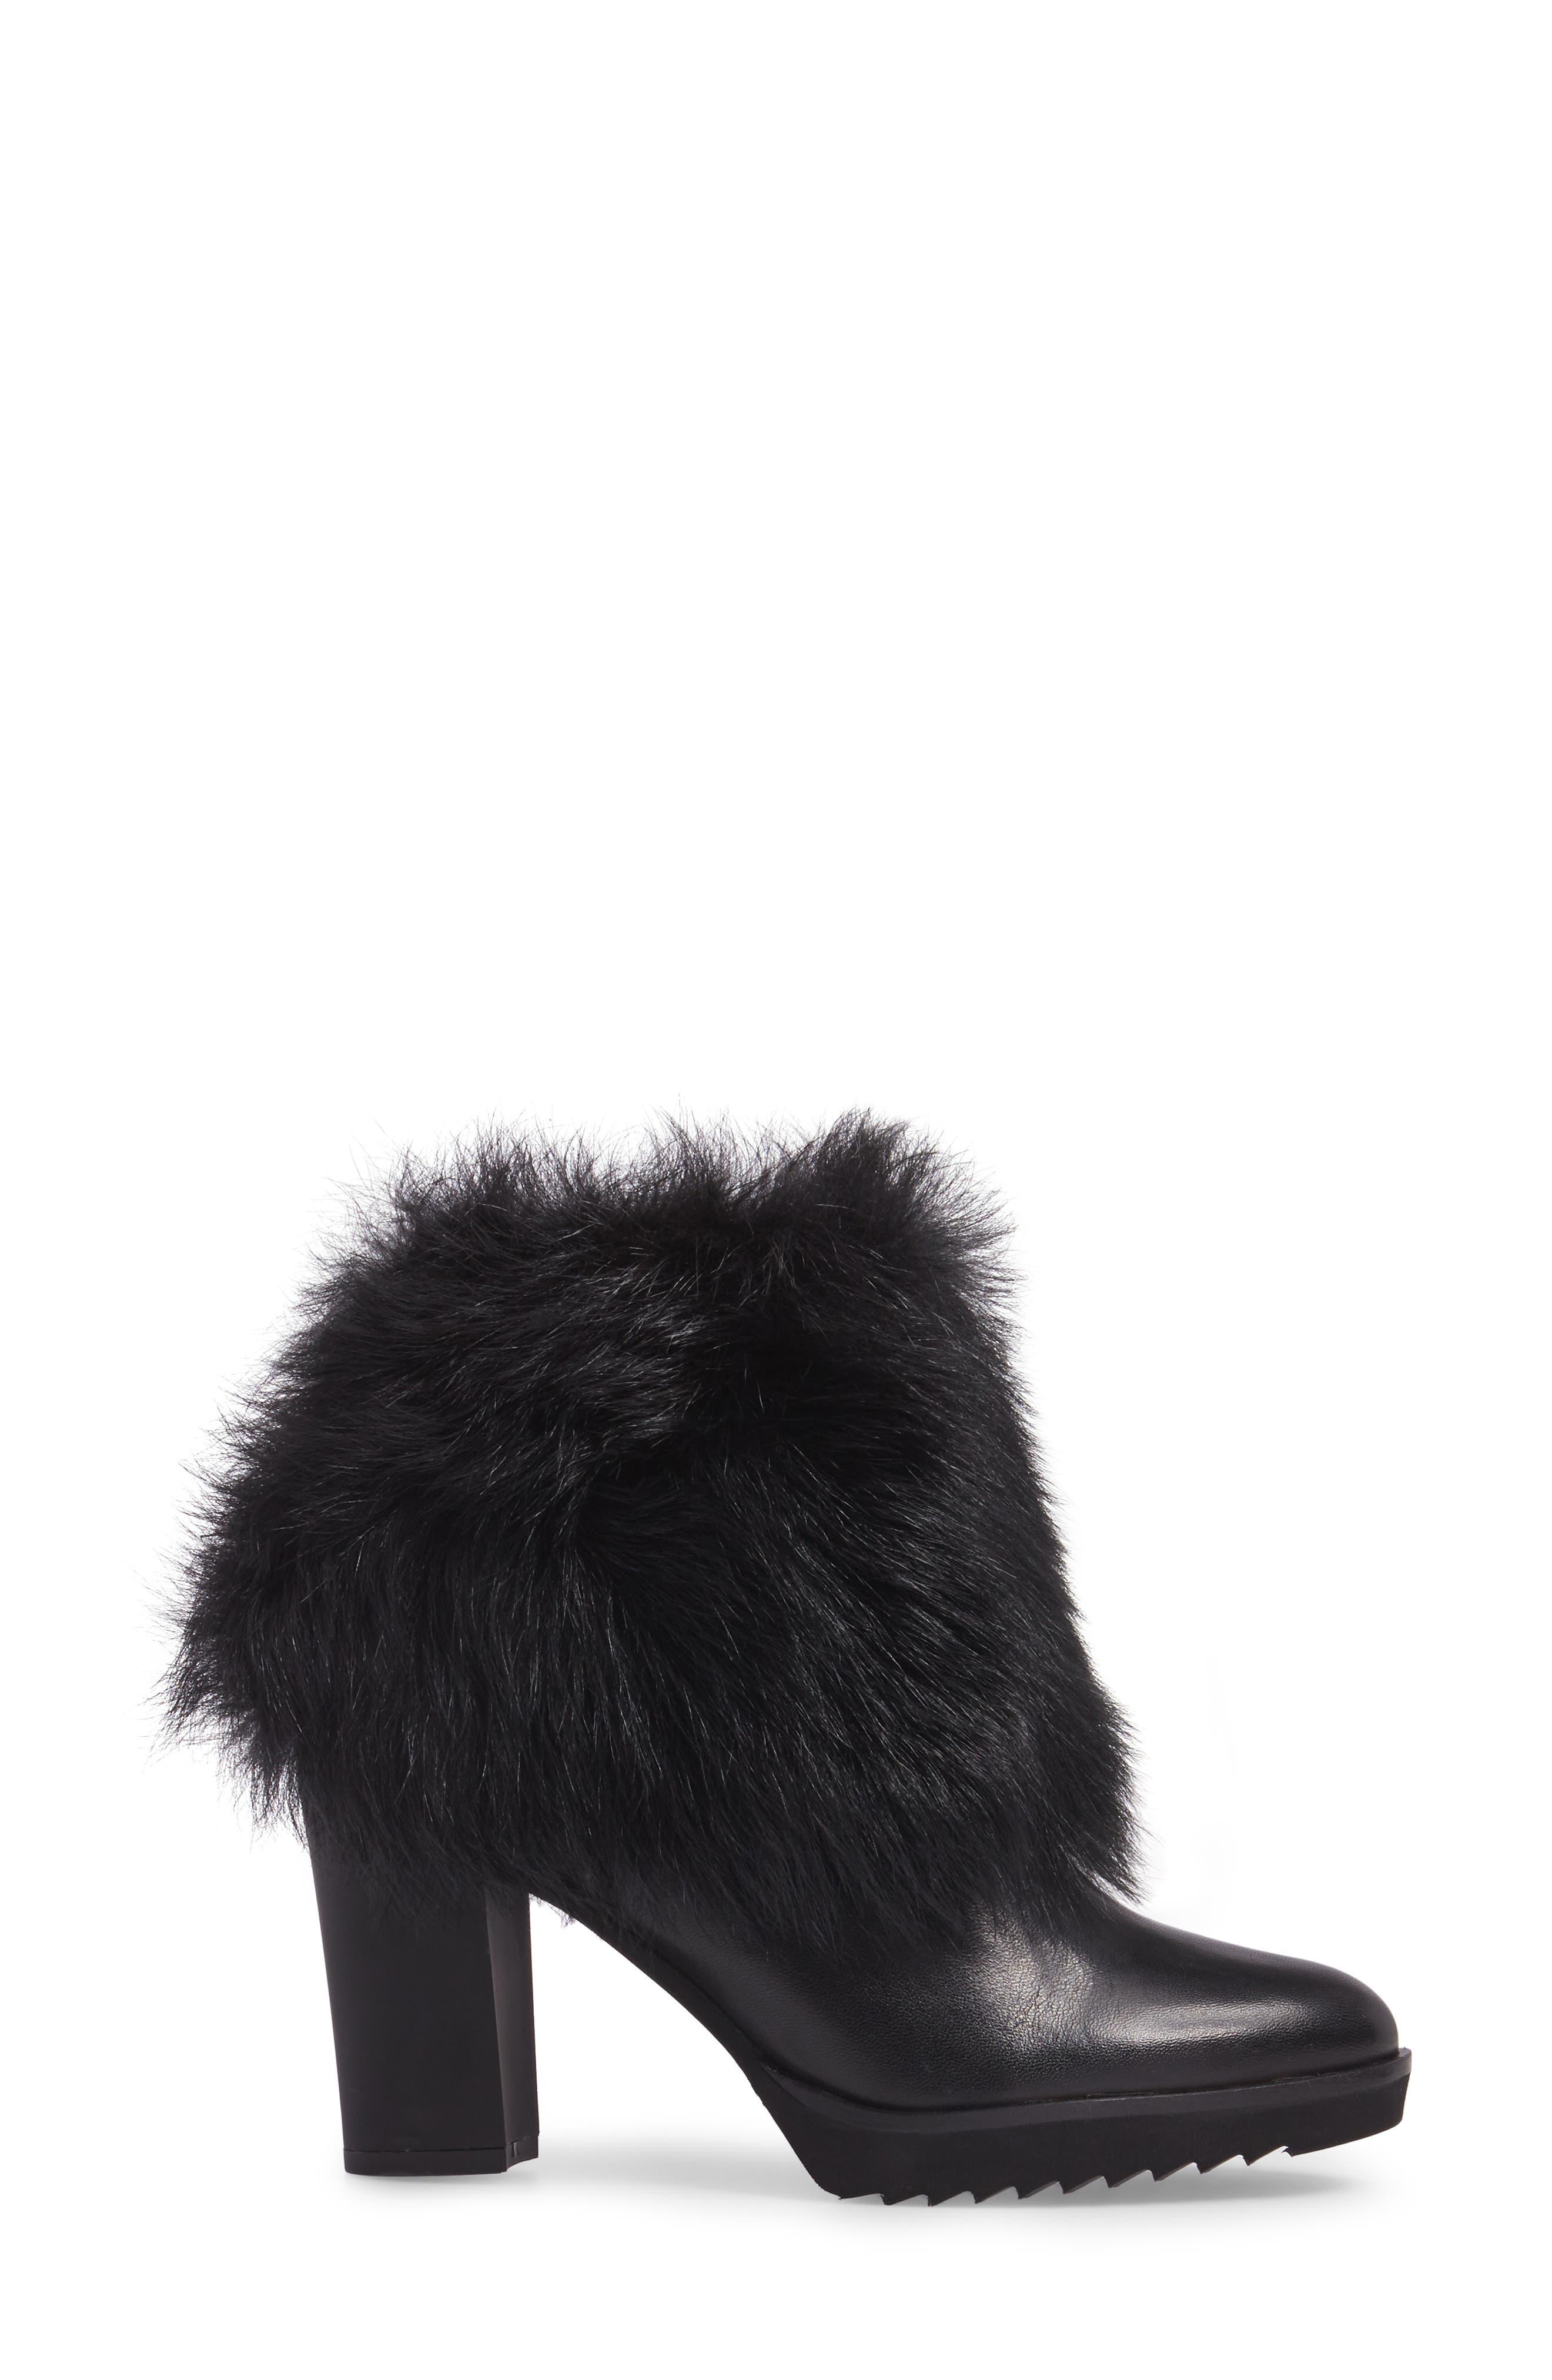 Roslyn Block Heel Genuine Shearling Bootie,                             Alternate thumbnail 3, color,                             Black Leather